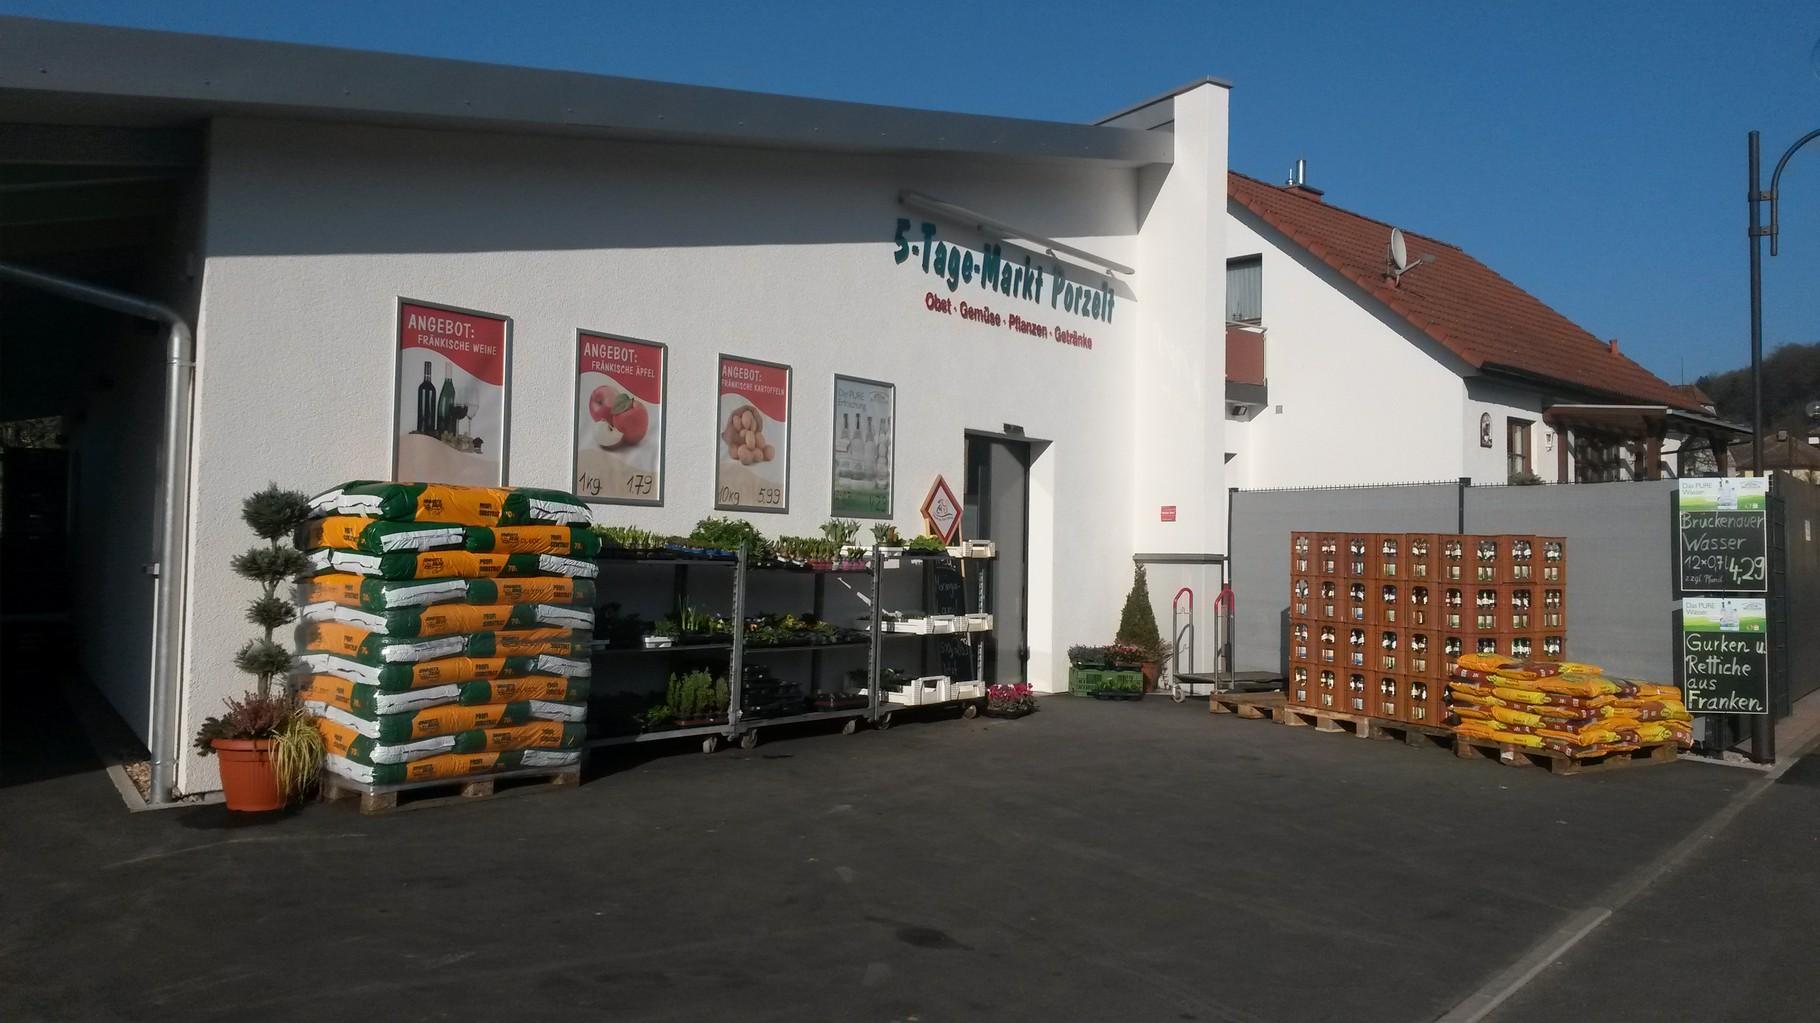 5-Tage-Markt Porzelt